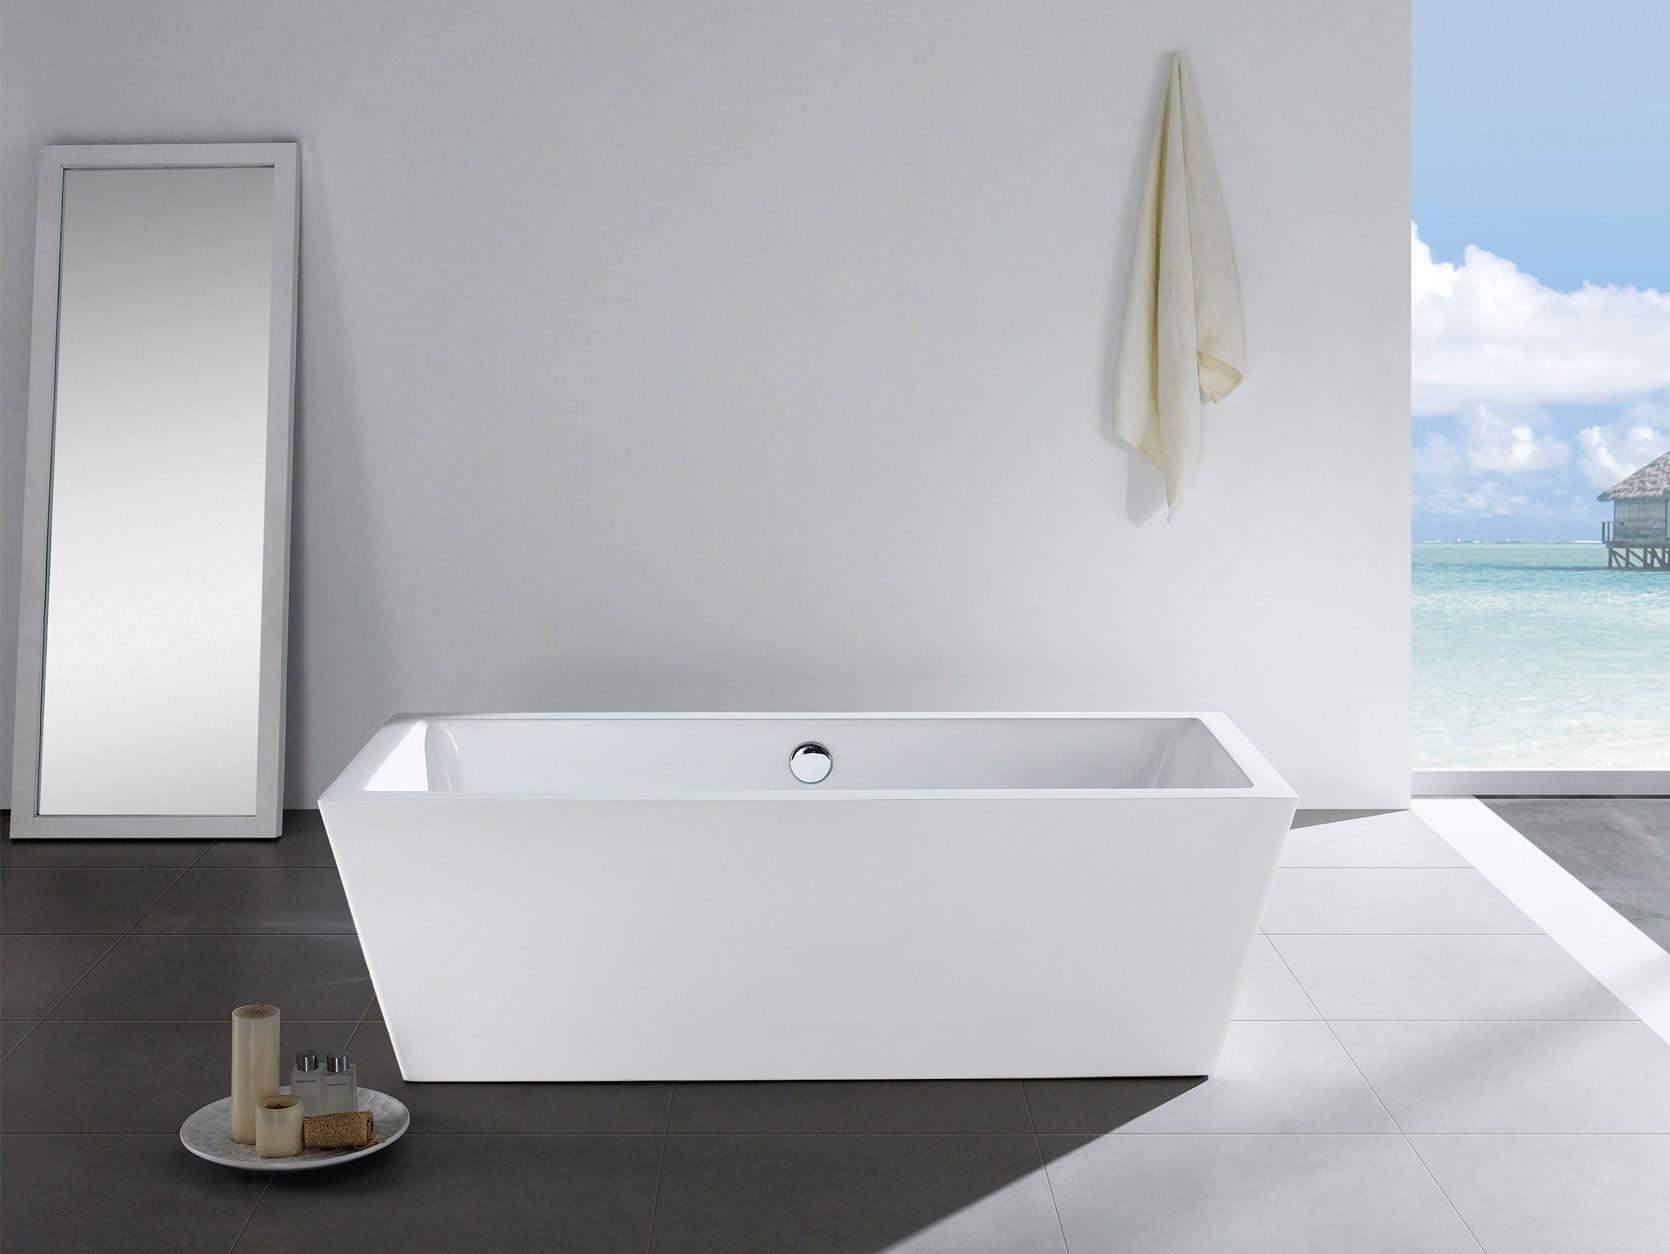 Wynn 65 X 31 White Rectangle Soaking Bathtub By Pacific Collection Walmart Com Walmart Com